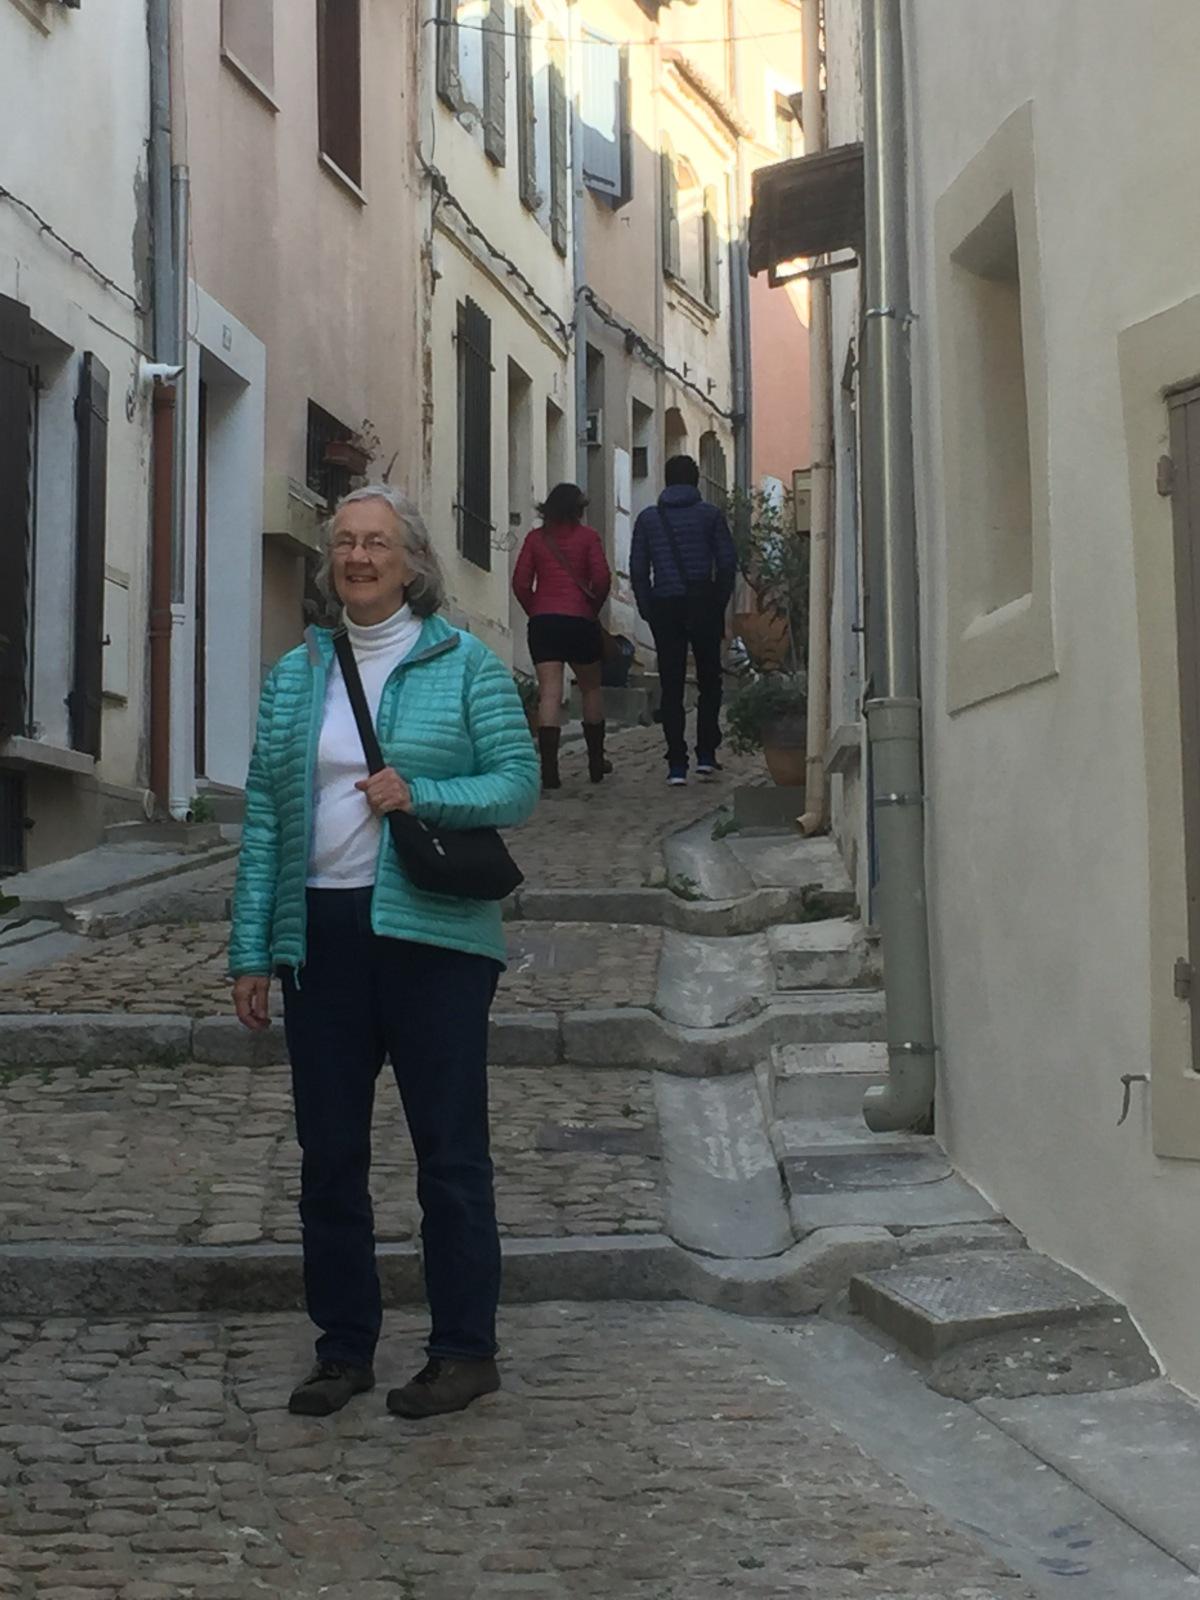 Barcelona, Spain to Arles,France